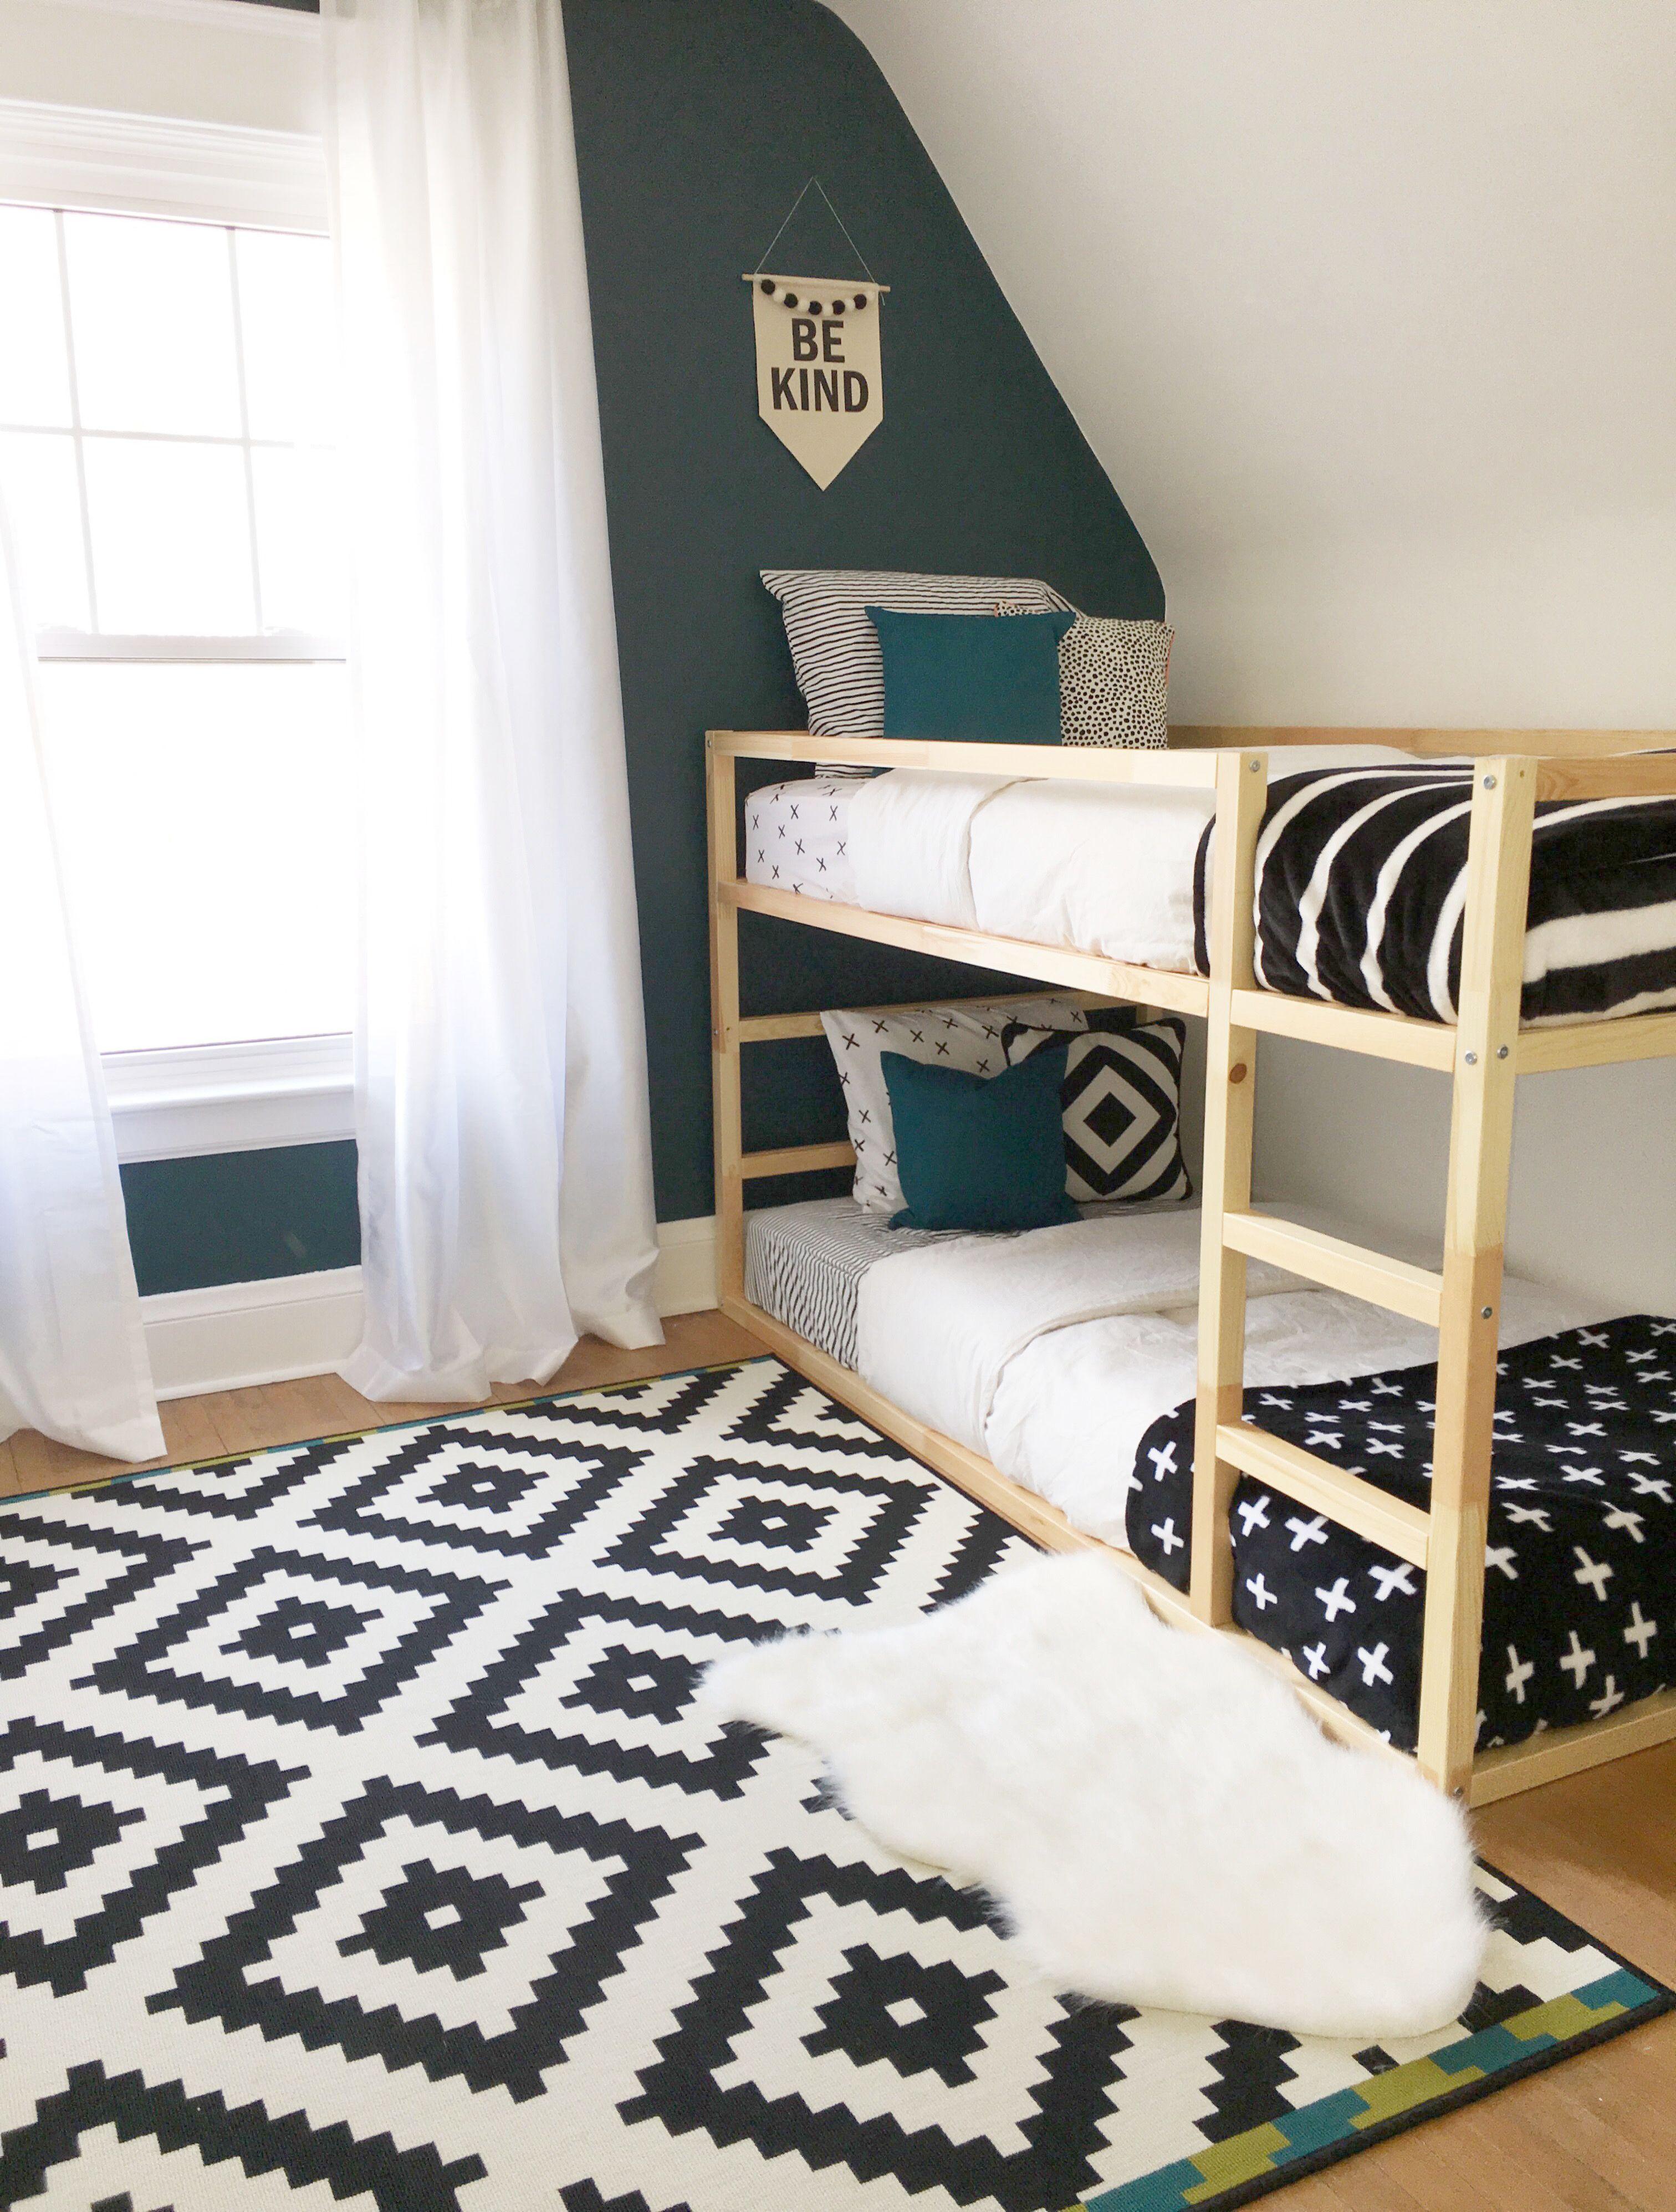 Tuft Needle Mattress Ikea Kids Room Kids Room Design Shared